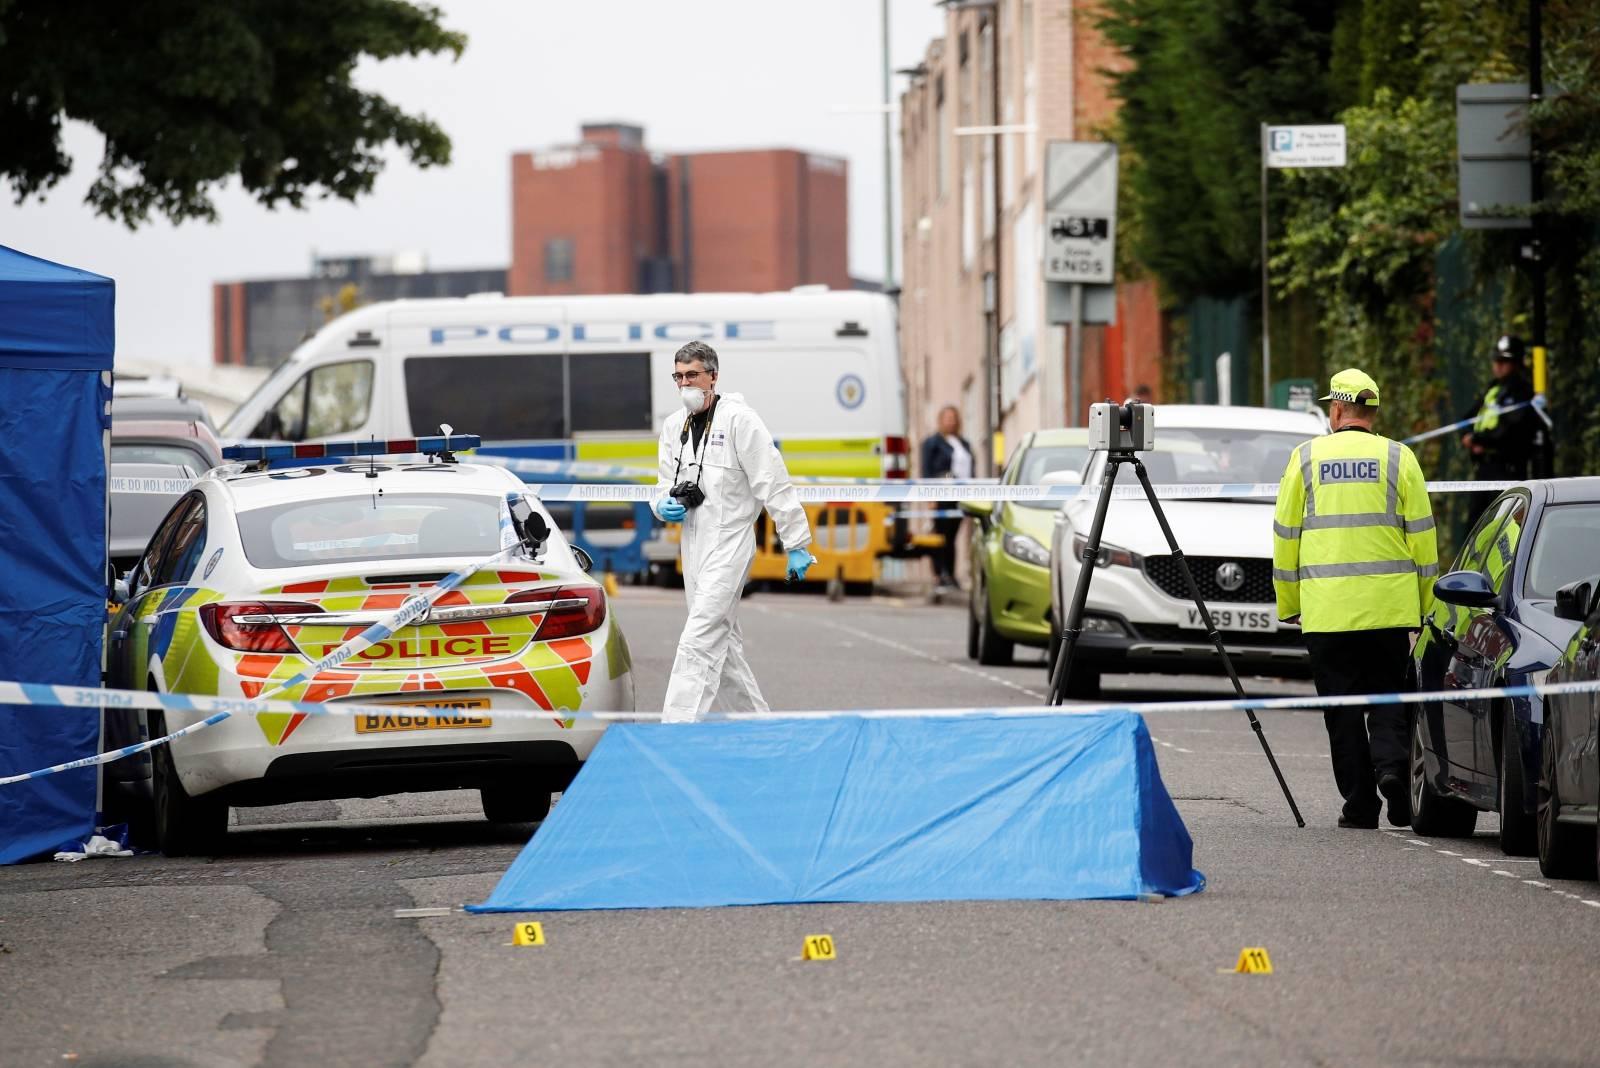 Scene of reported stabbings in Birmingham